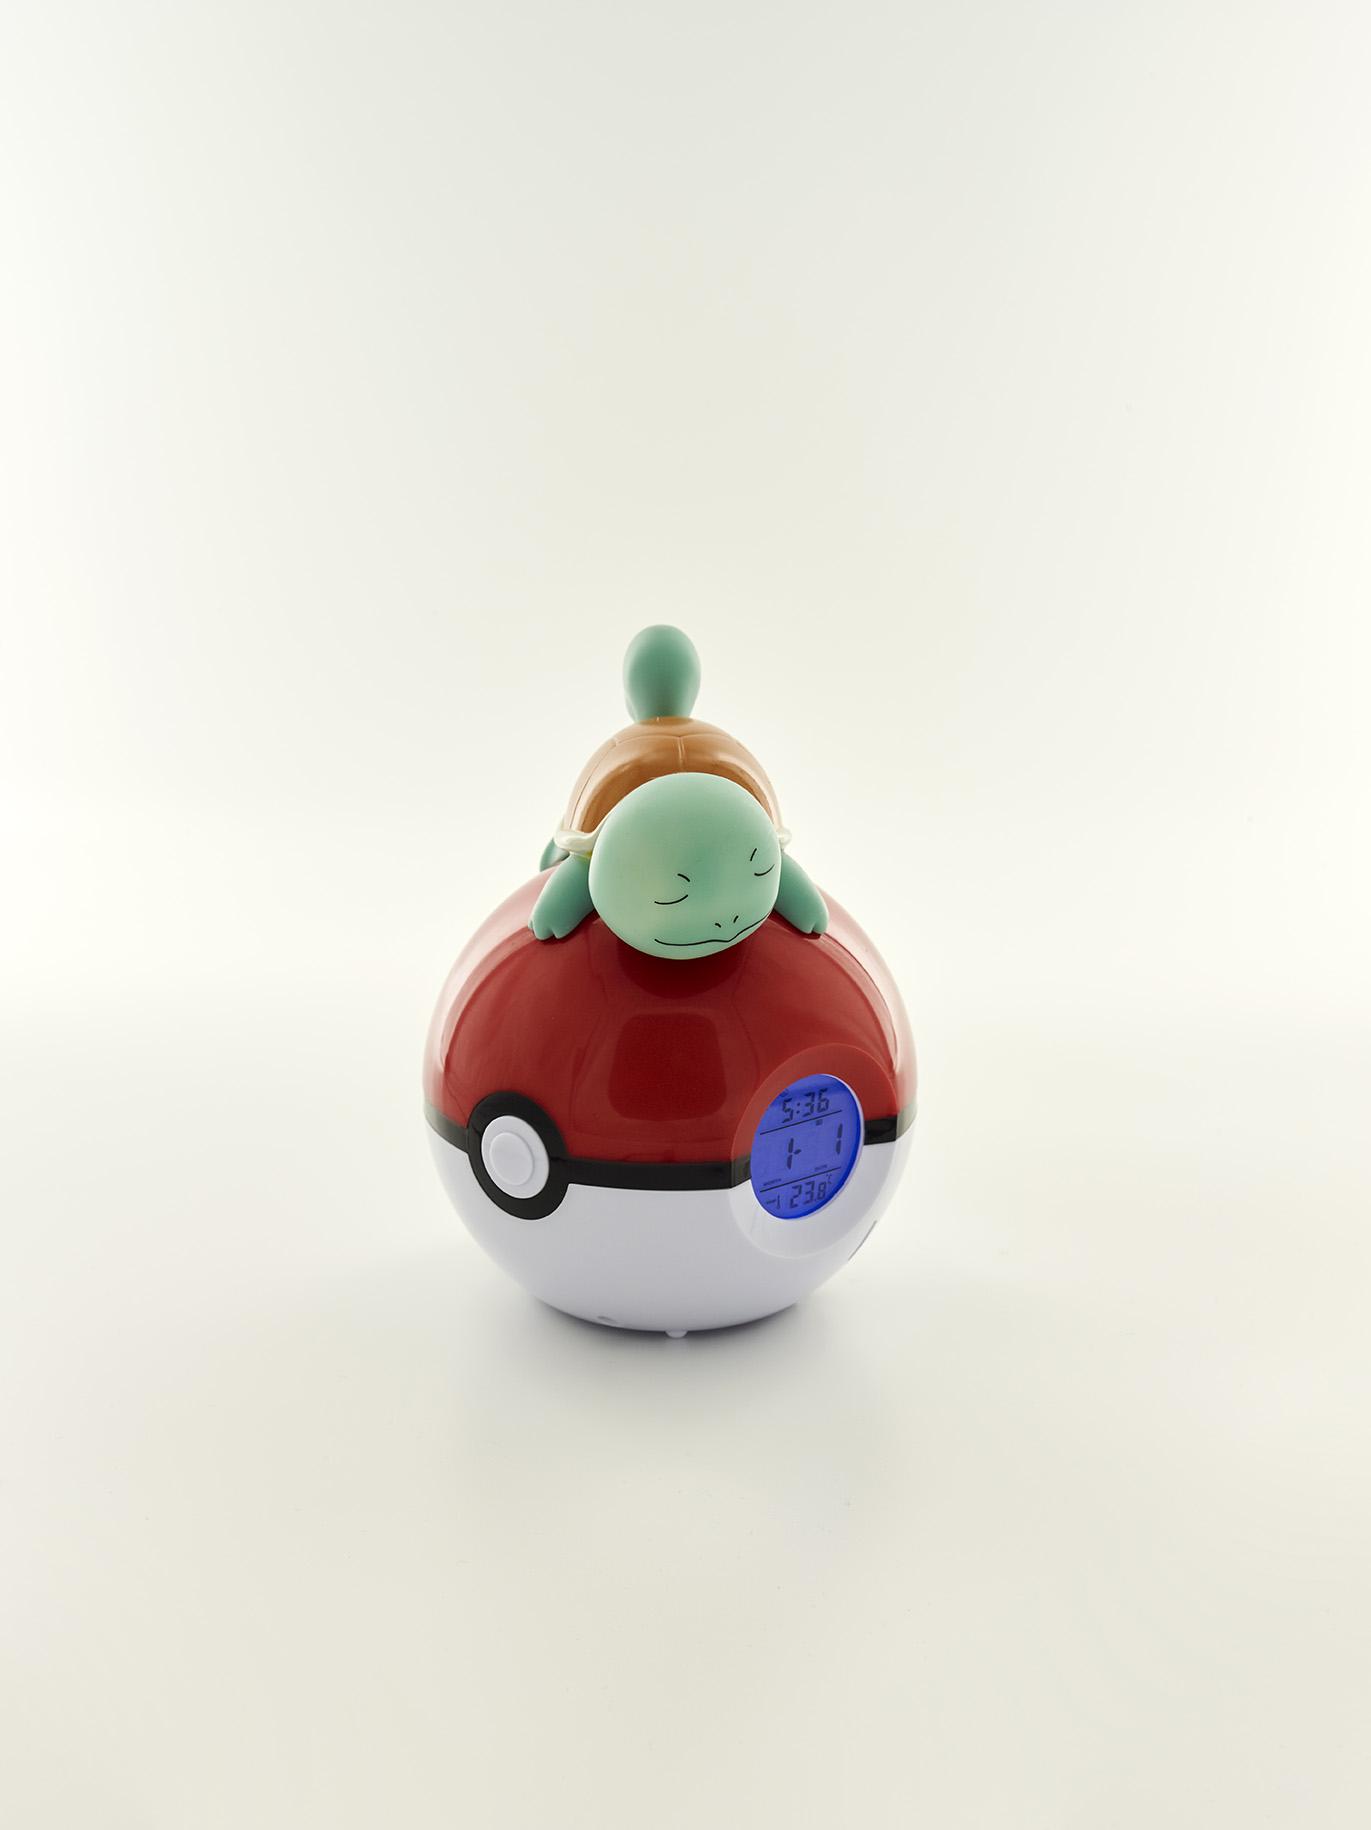 Pokémon Squirtle Night light and Alarm Clock 1